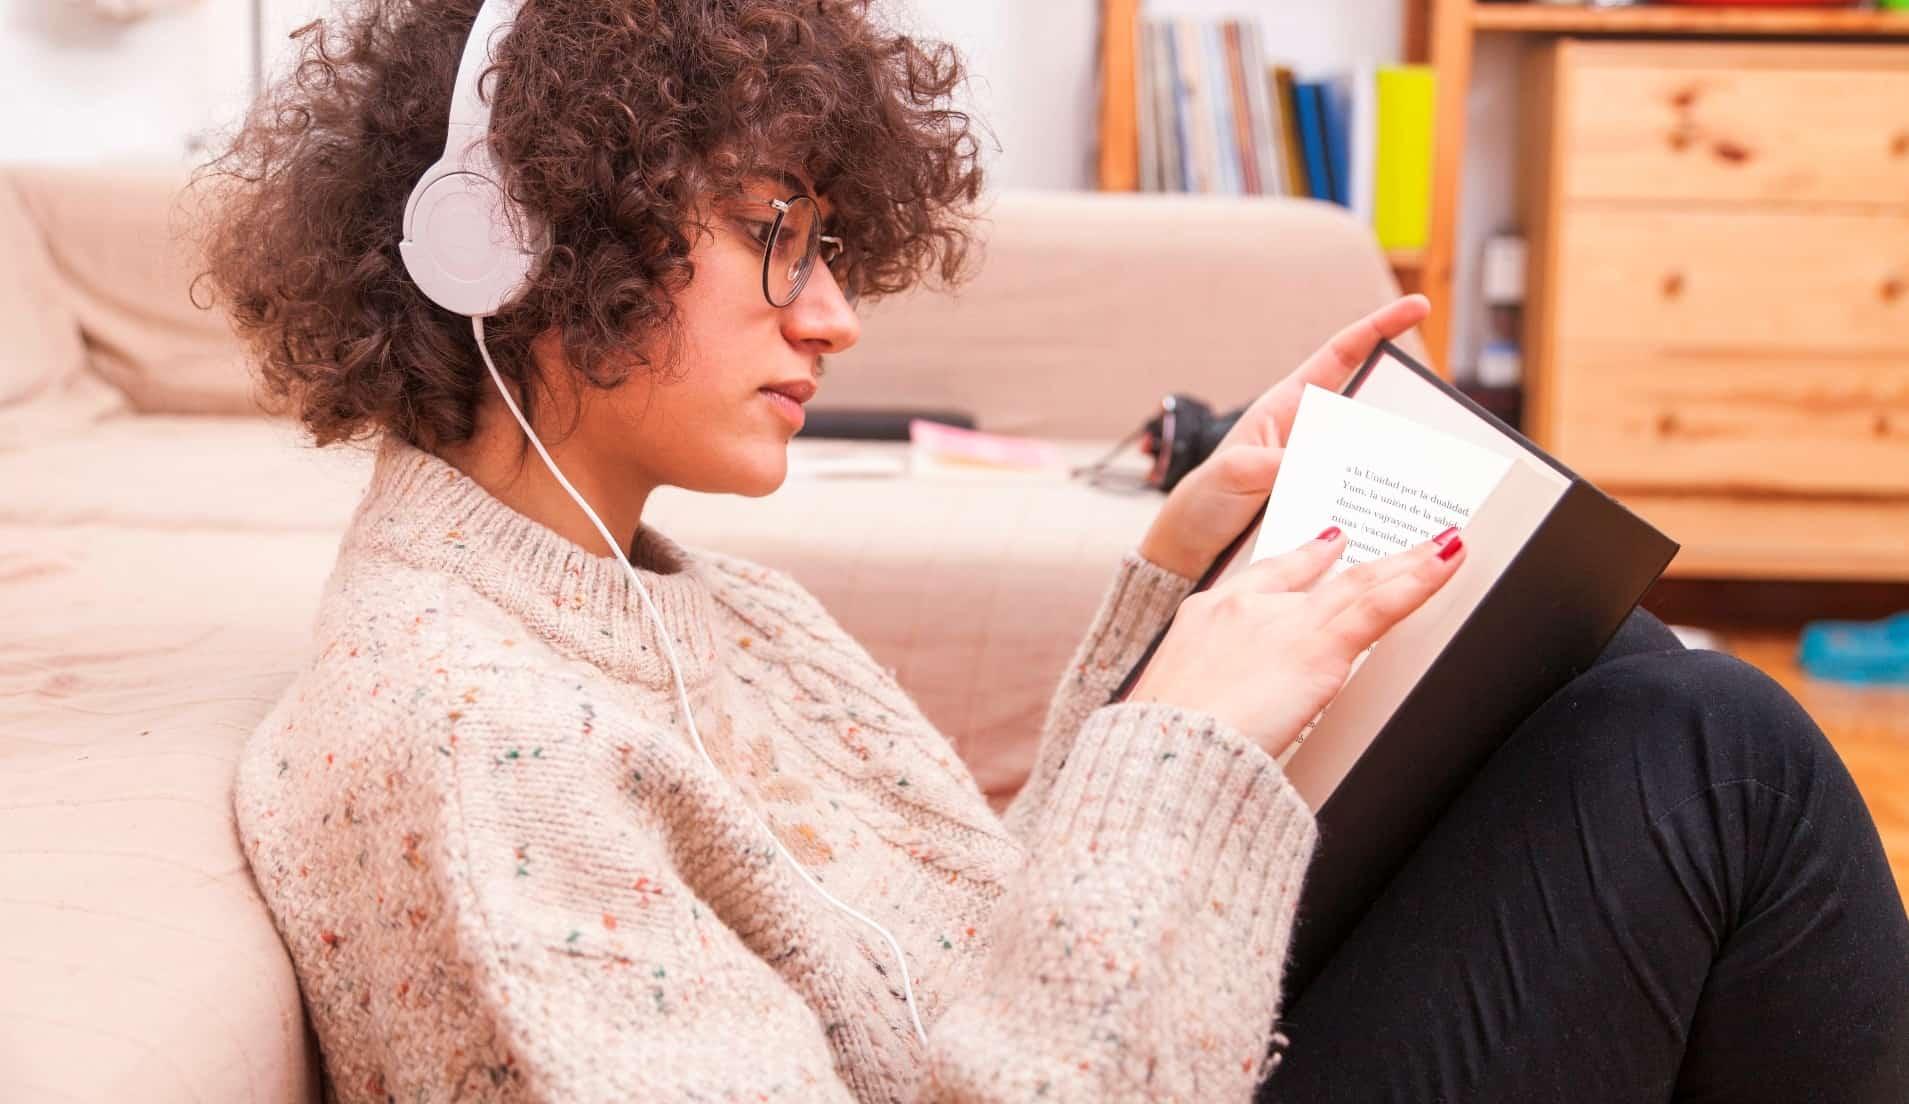 listening through headphone